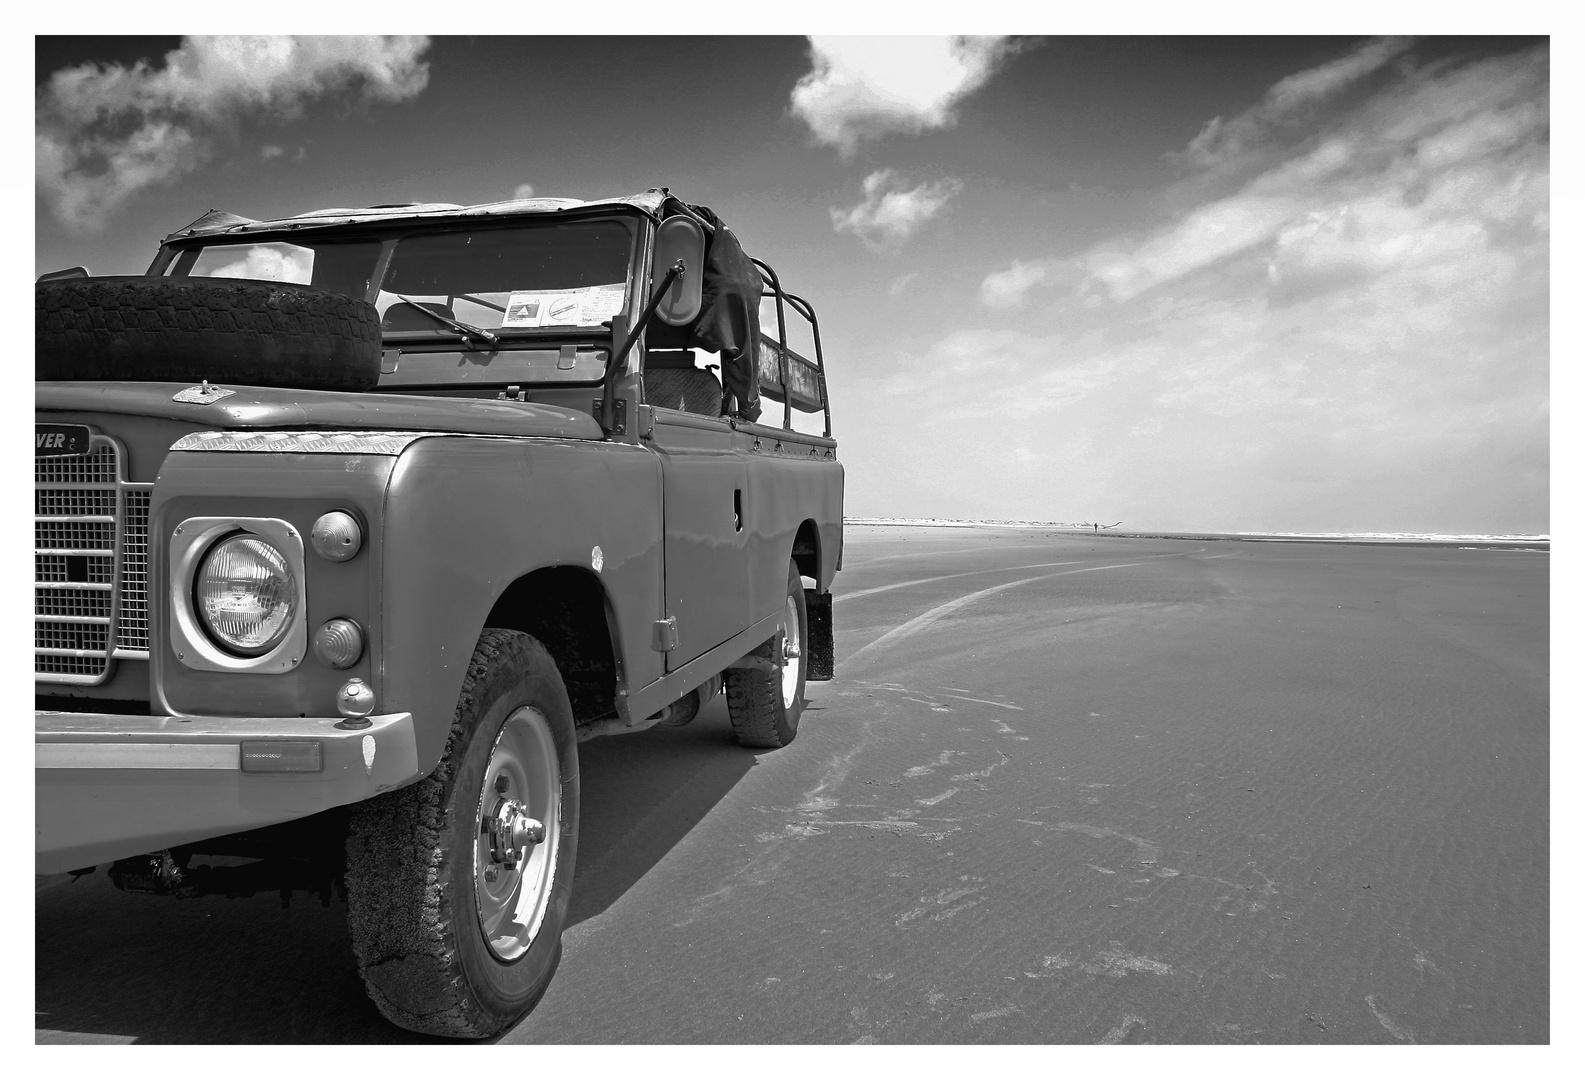 Beach Rover & Sky